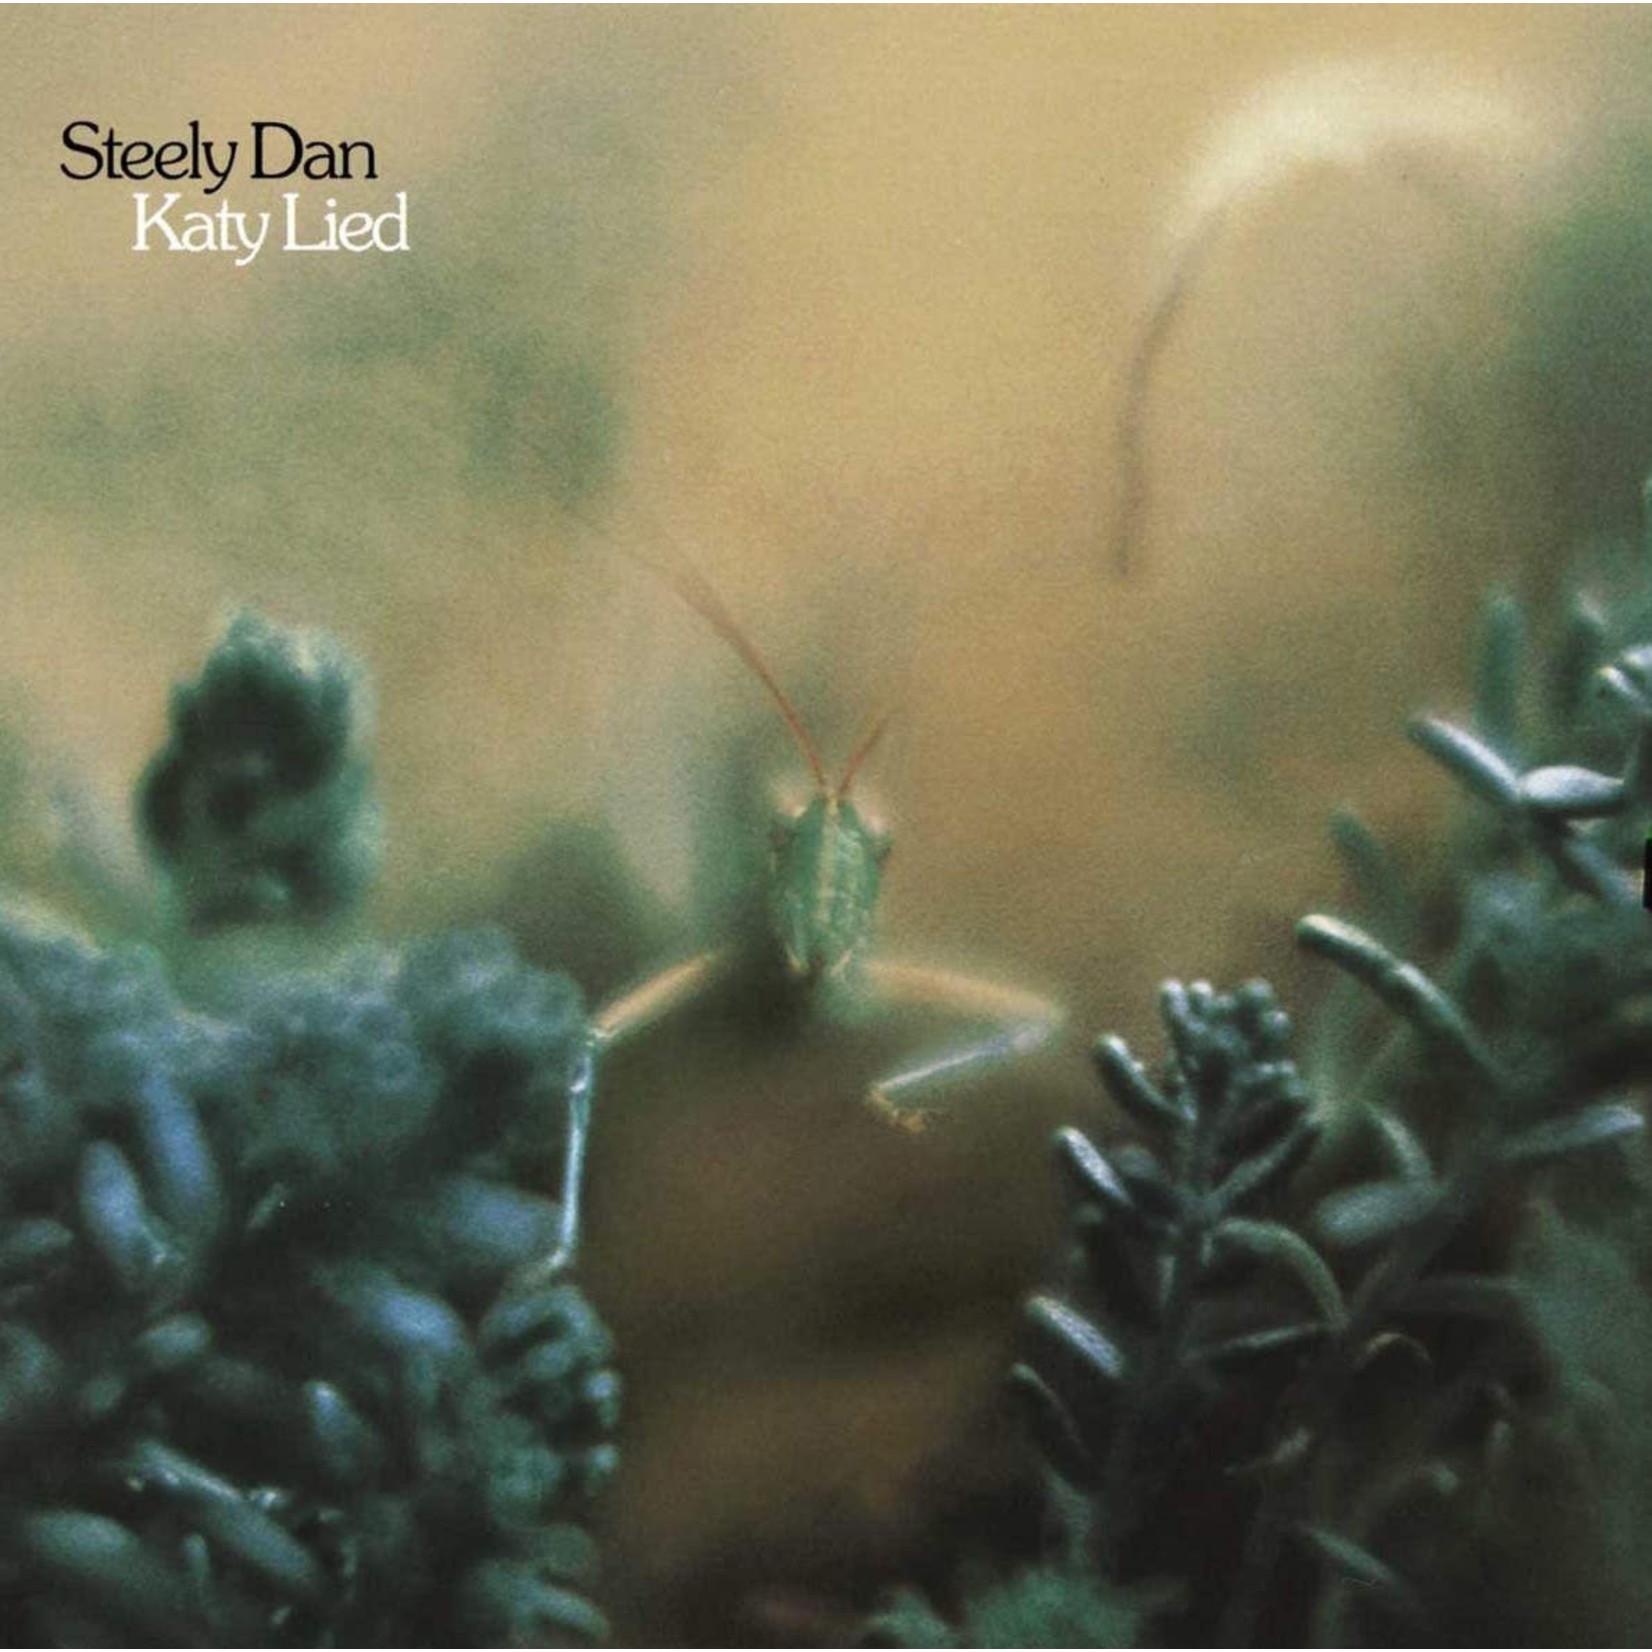 [Vintage] Steely Dan: Katy Lied